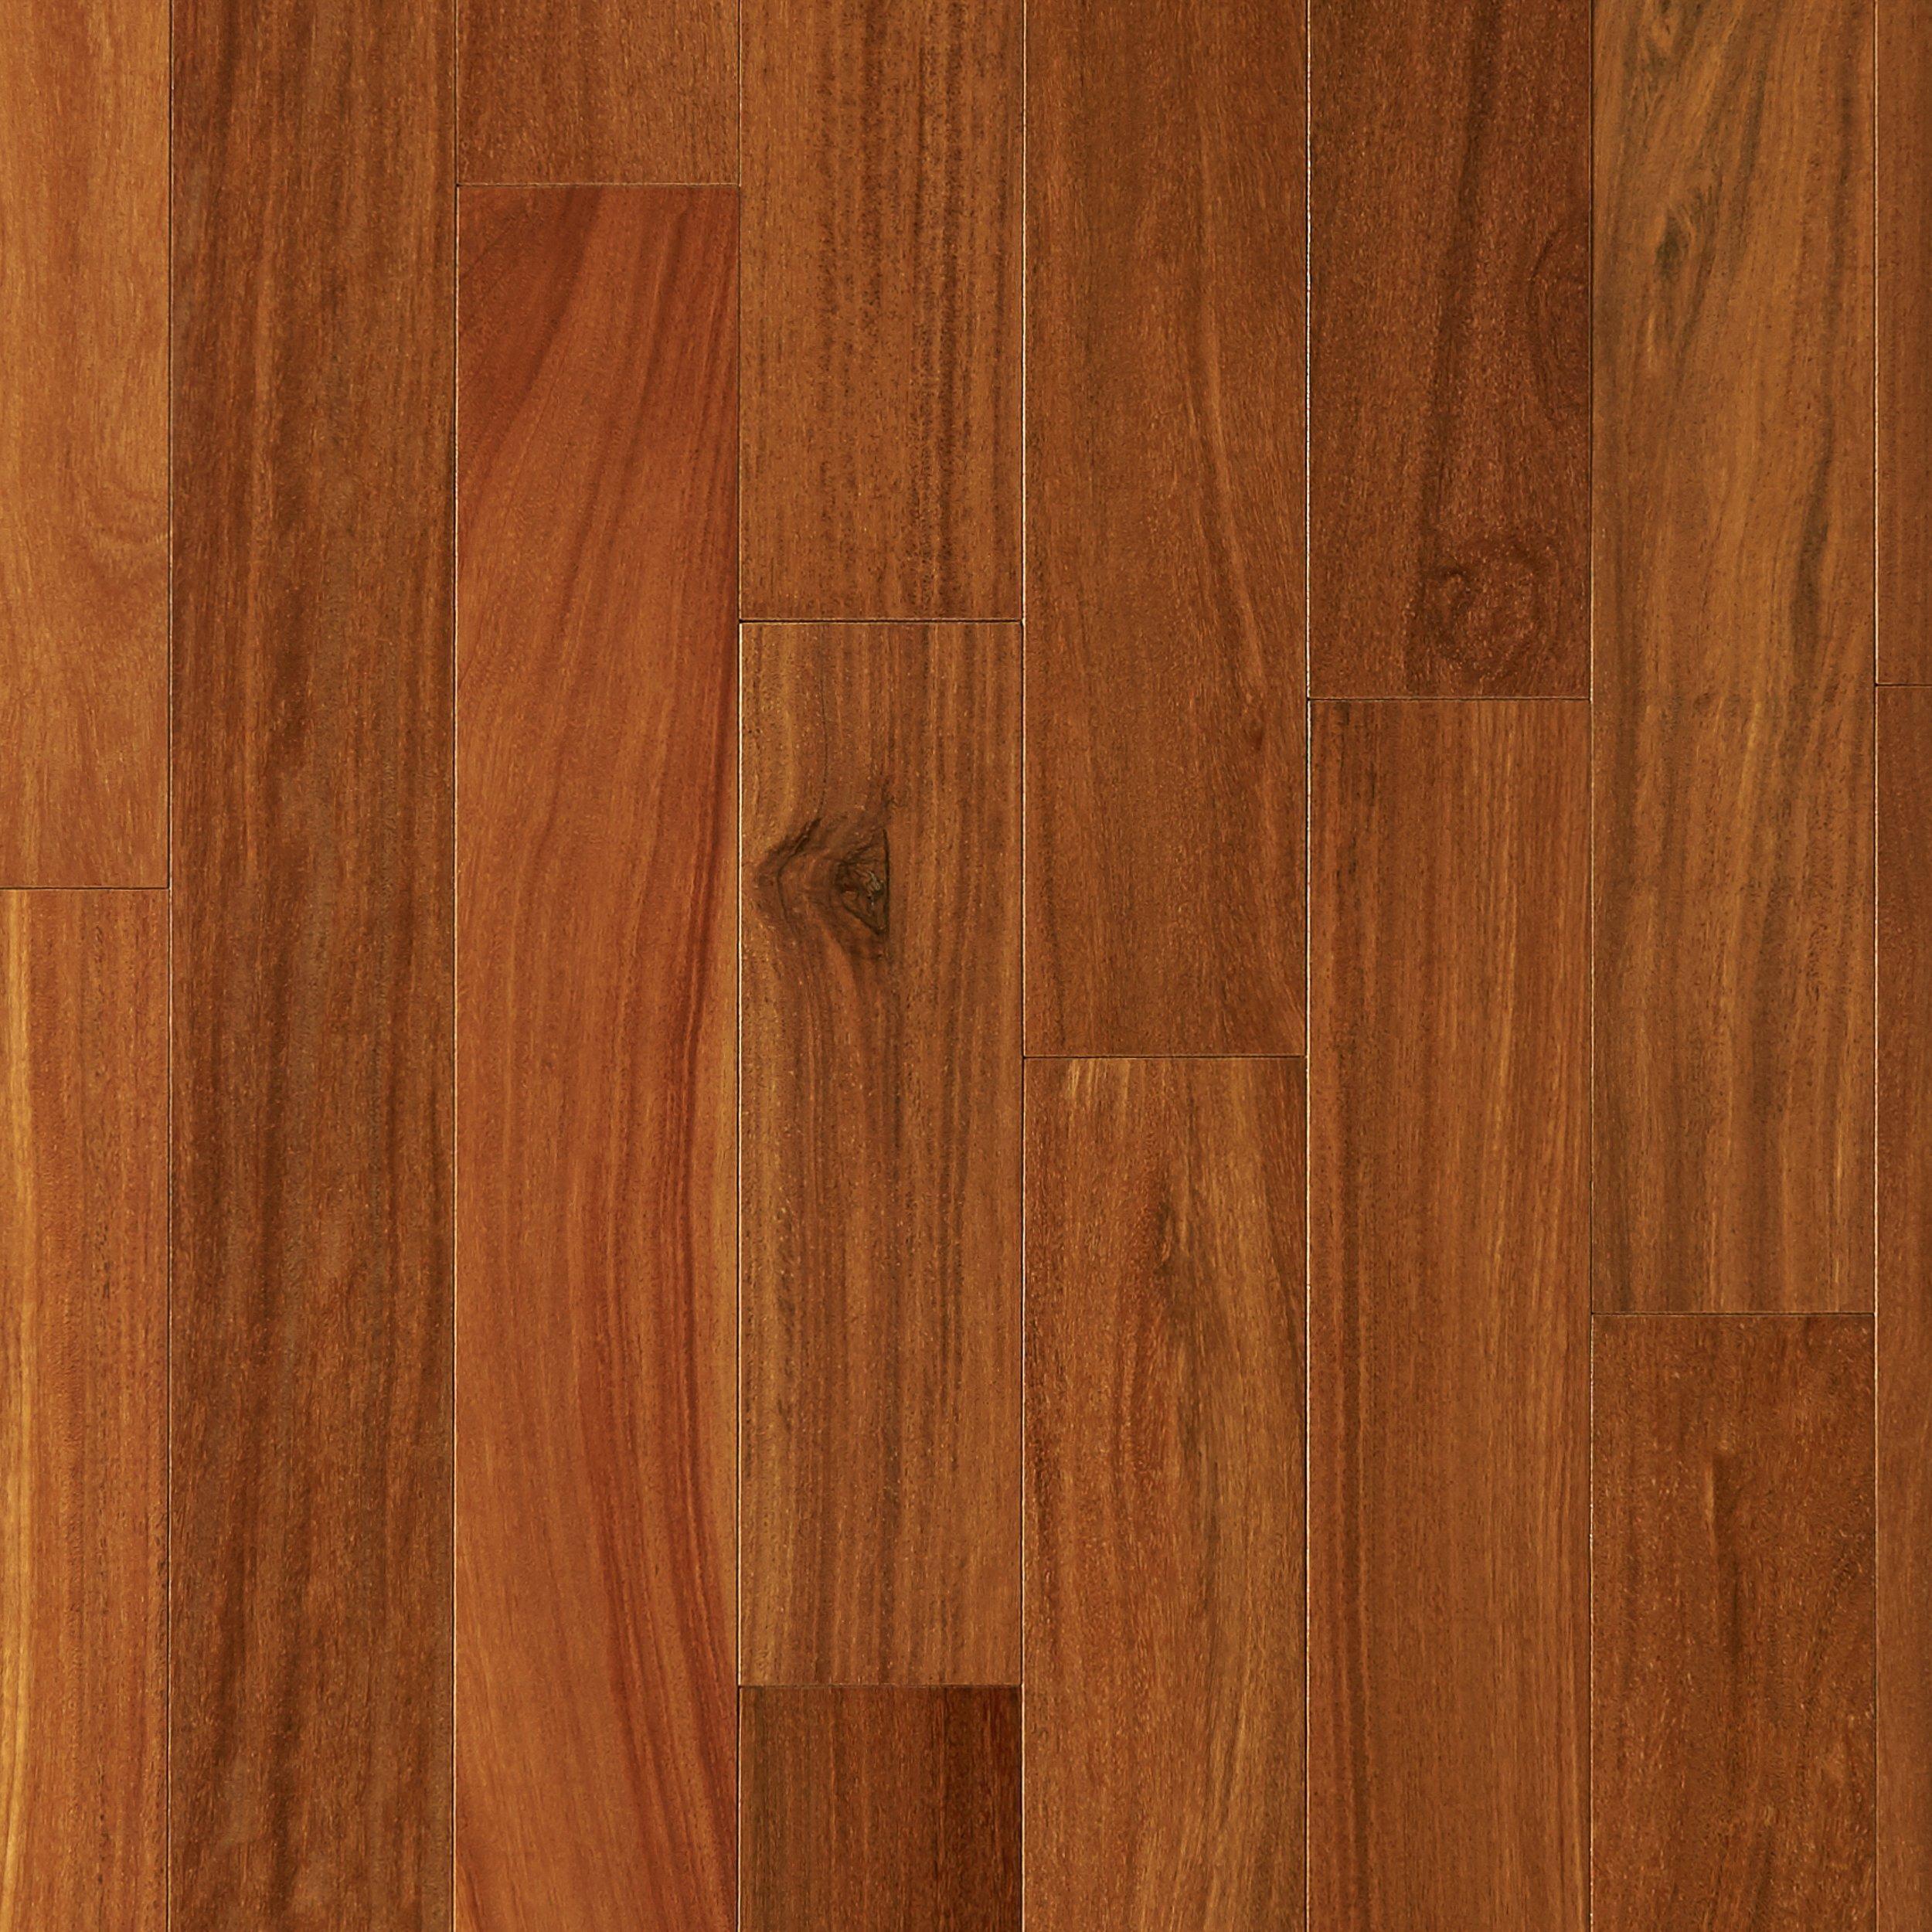 High Quality Cumaru Brazilian Teak Smooth Locking Engineered Hardwood